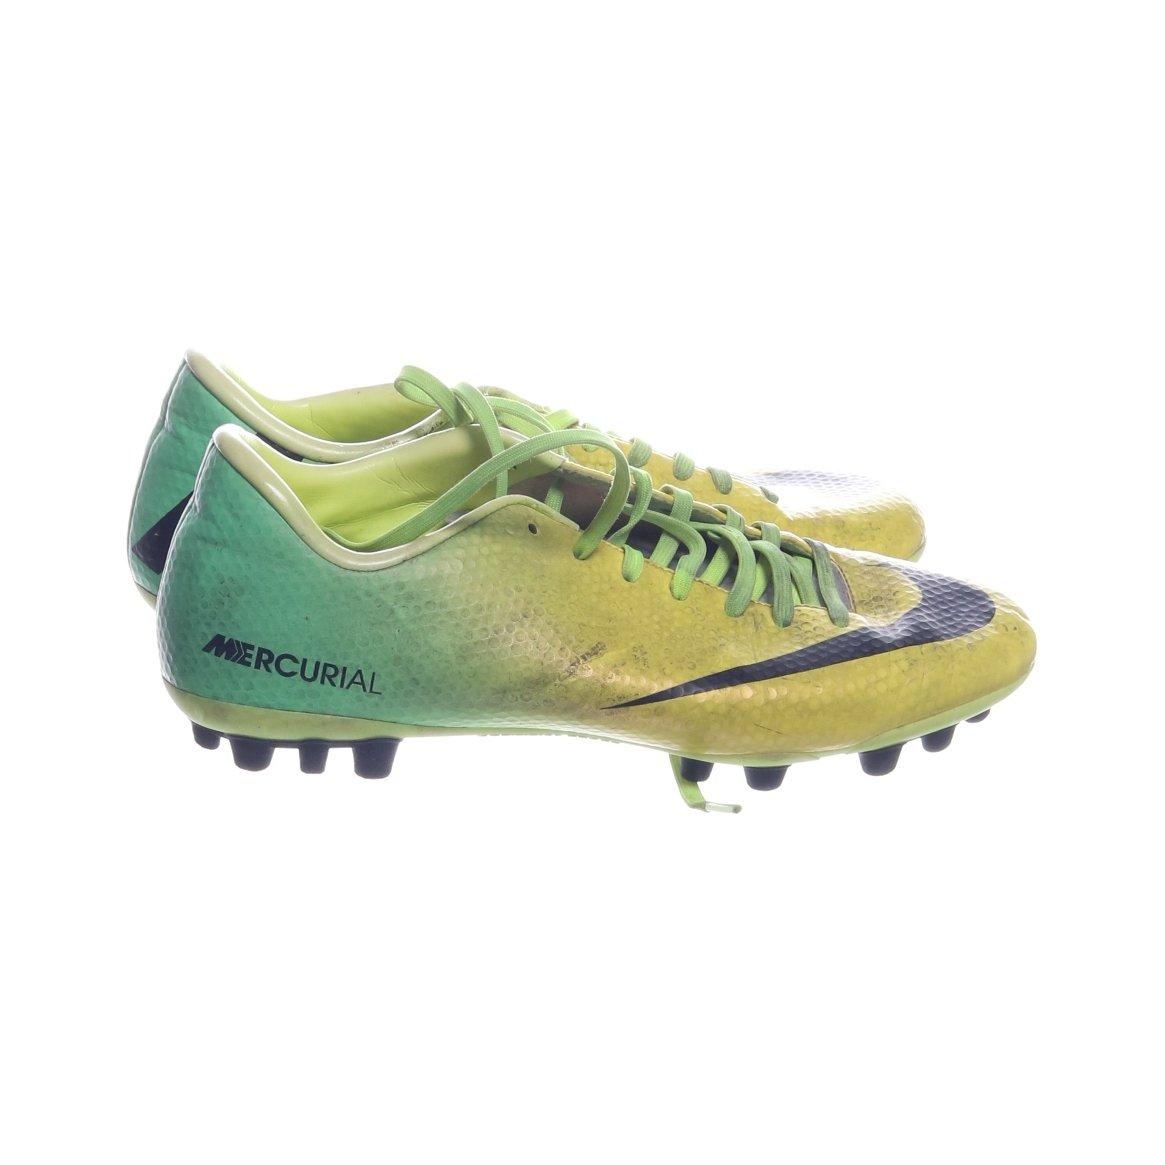 sports shoes c0980 3e2b8 Nike, Fotbollsskor, Strl  39, Mercurial, Gul Grön Svart